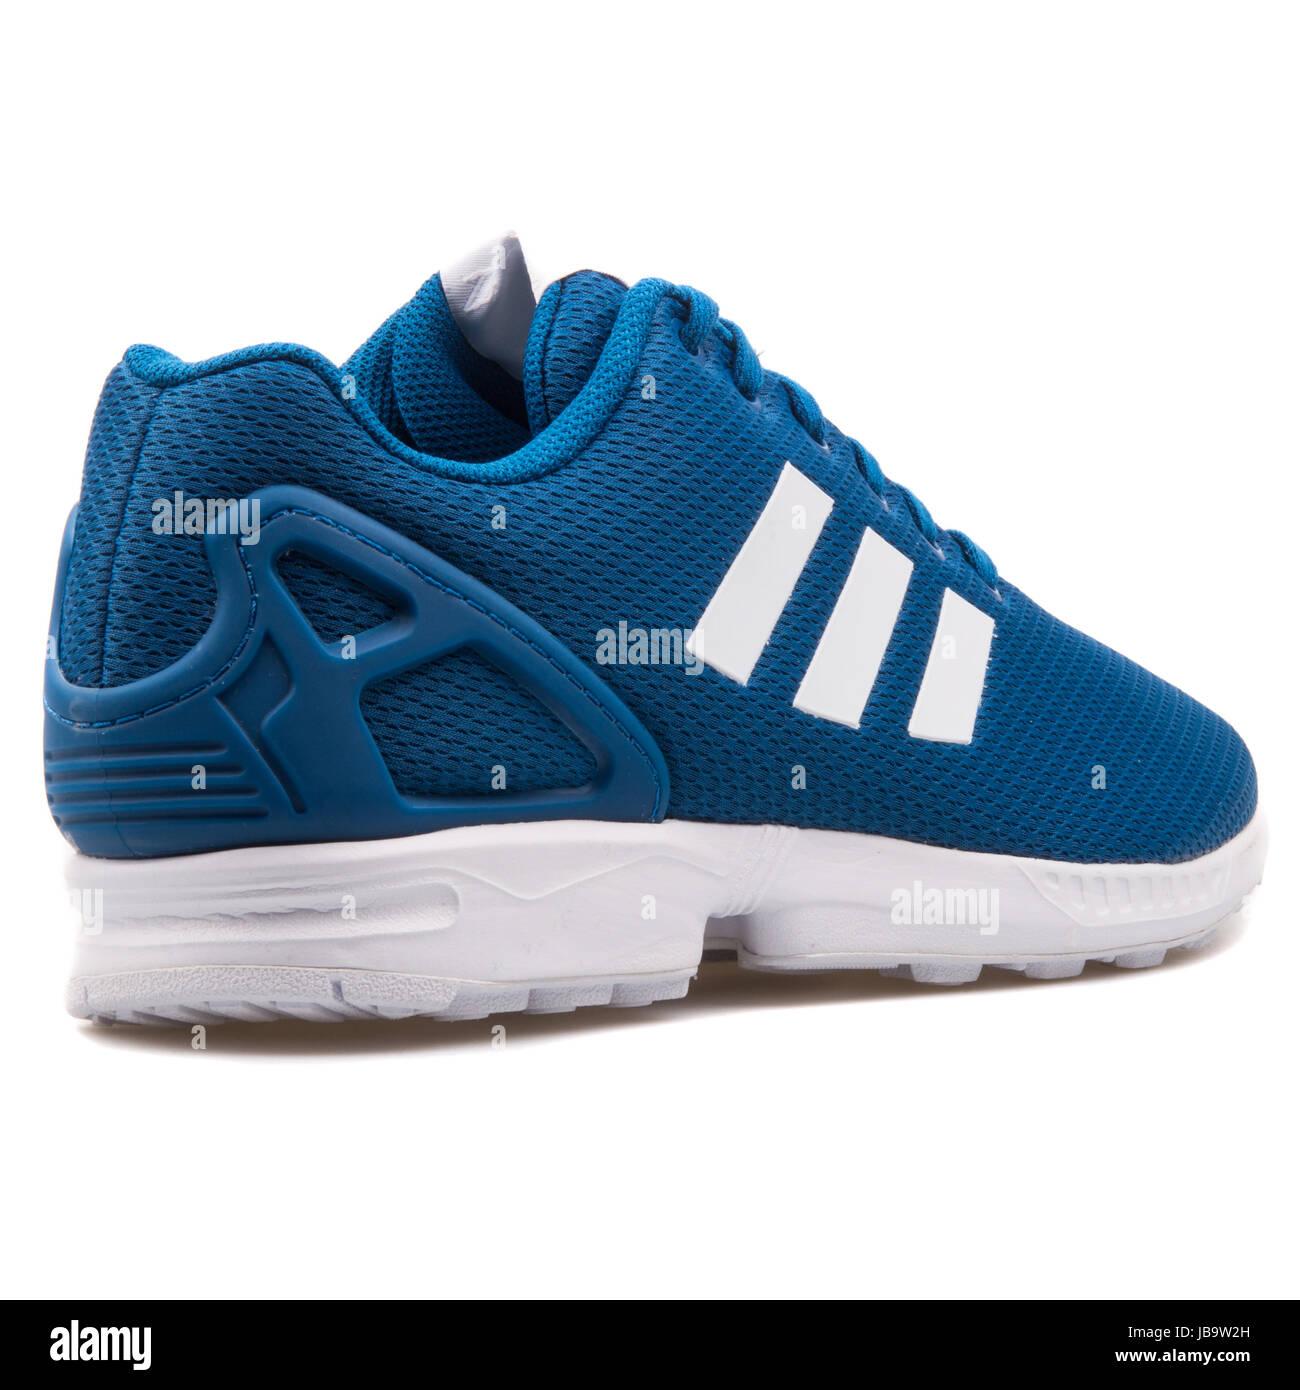 51c9525362c8e Adidas ZX Flux Blue Men s Running Shoes - AF6344 - Stock Image